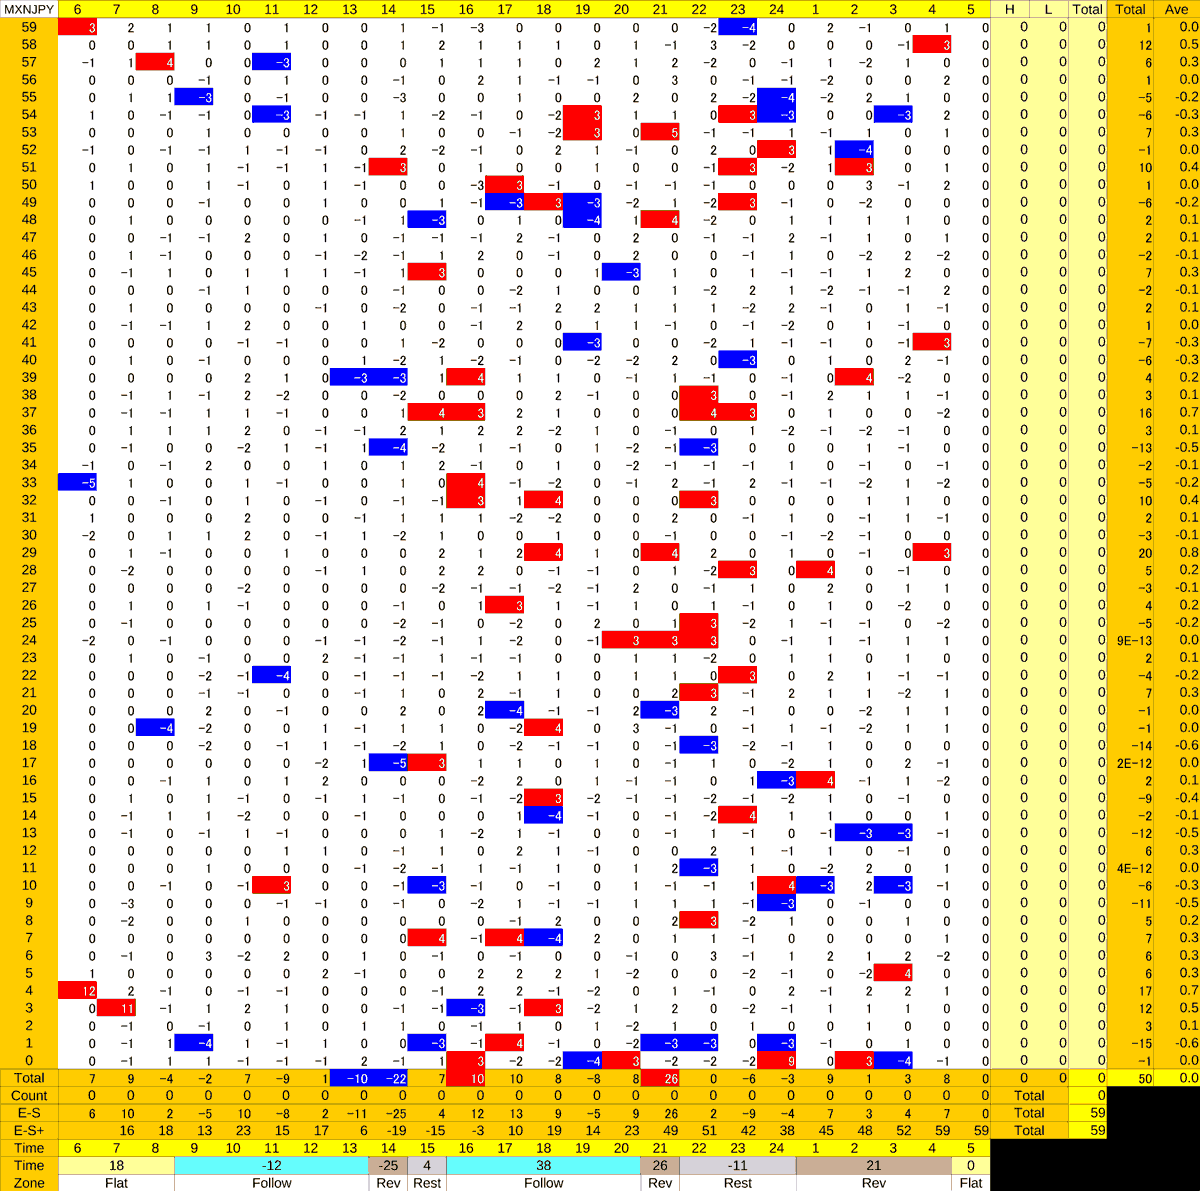 20201030_HS(3)MXNJPY